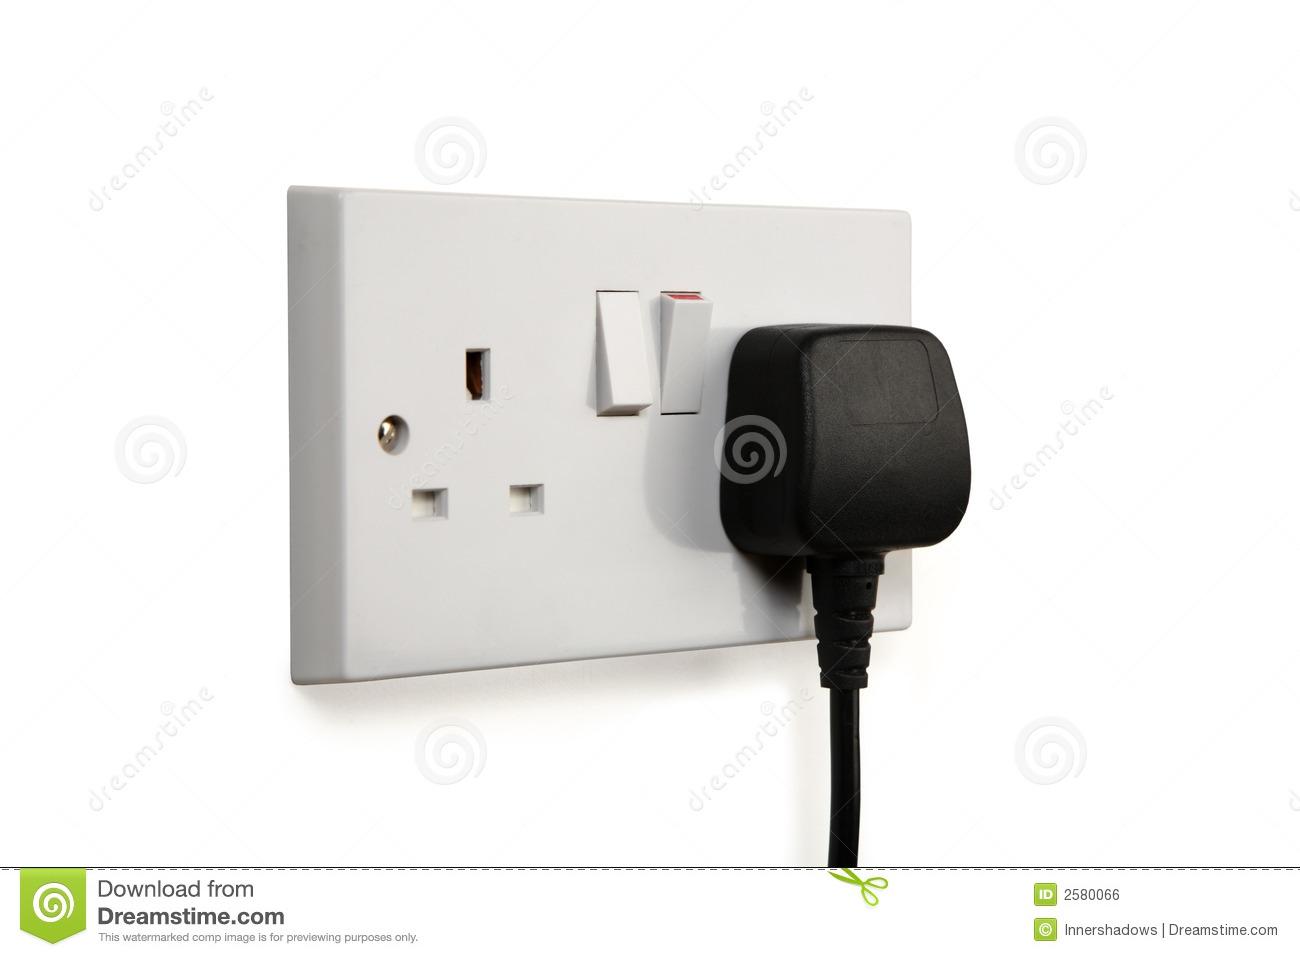 Socket and plug clipart.